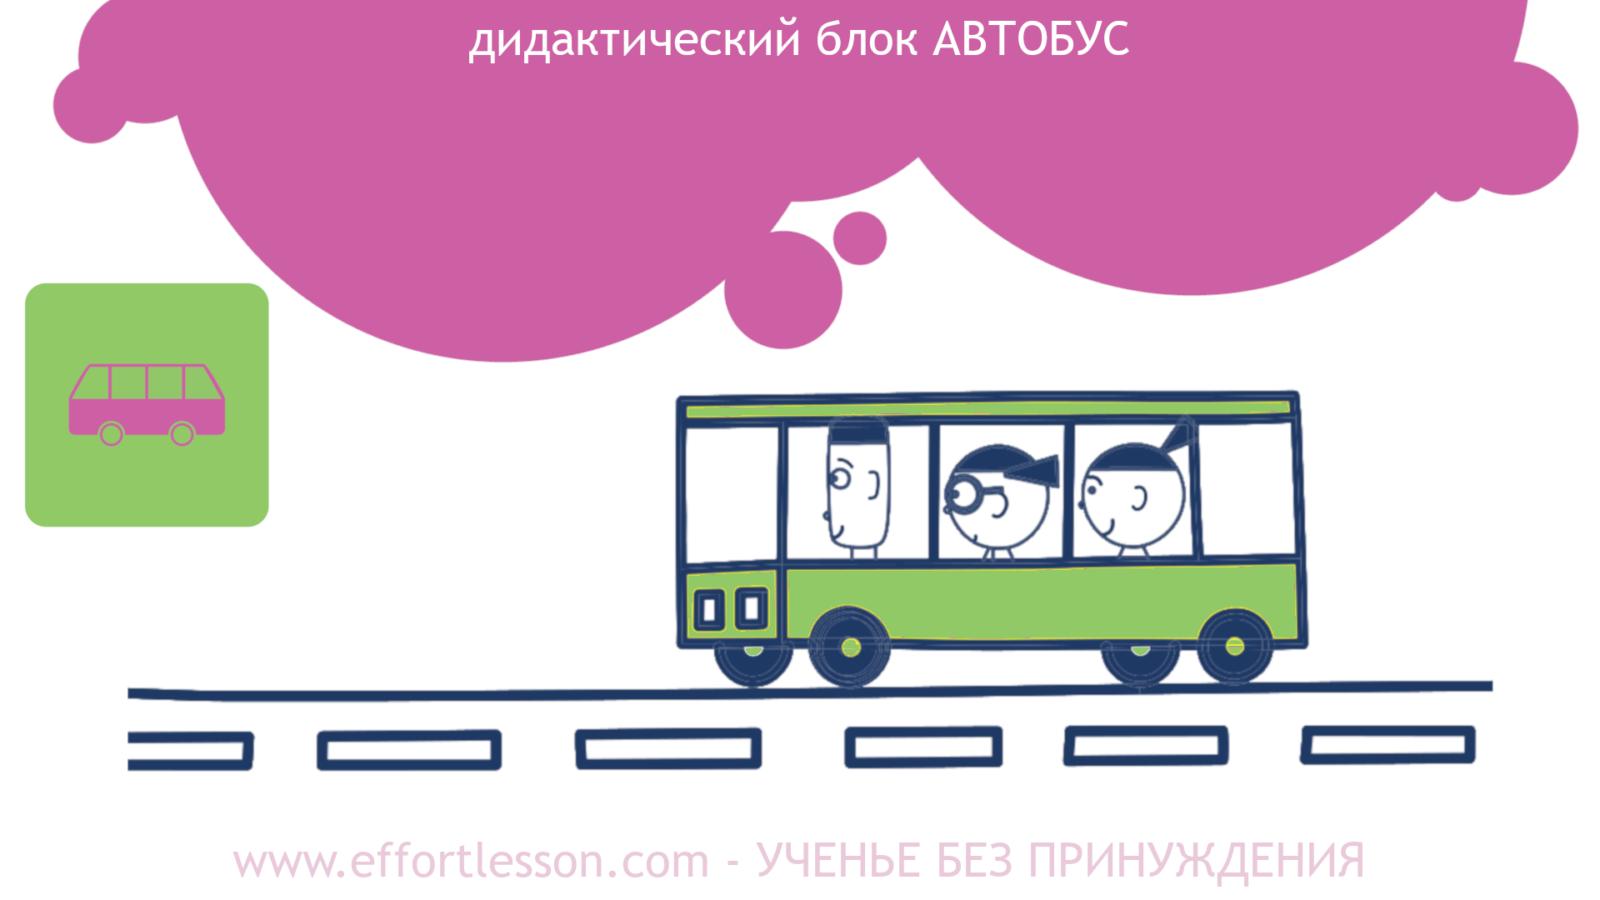 метод хейни автобус